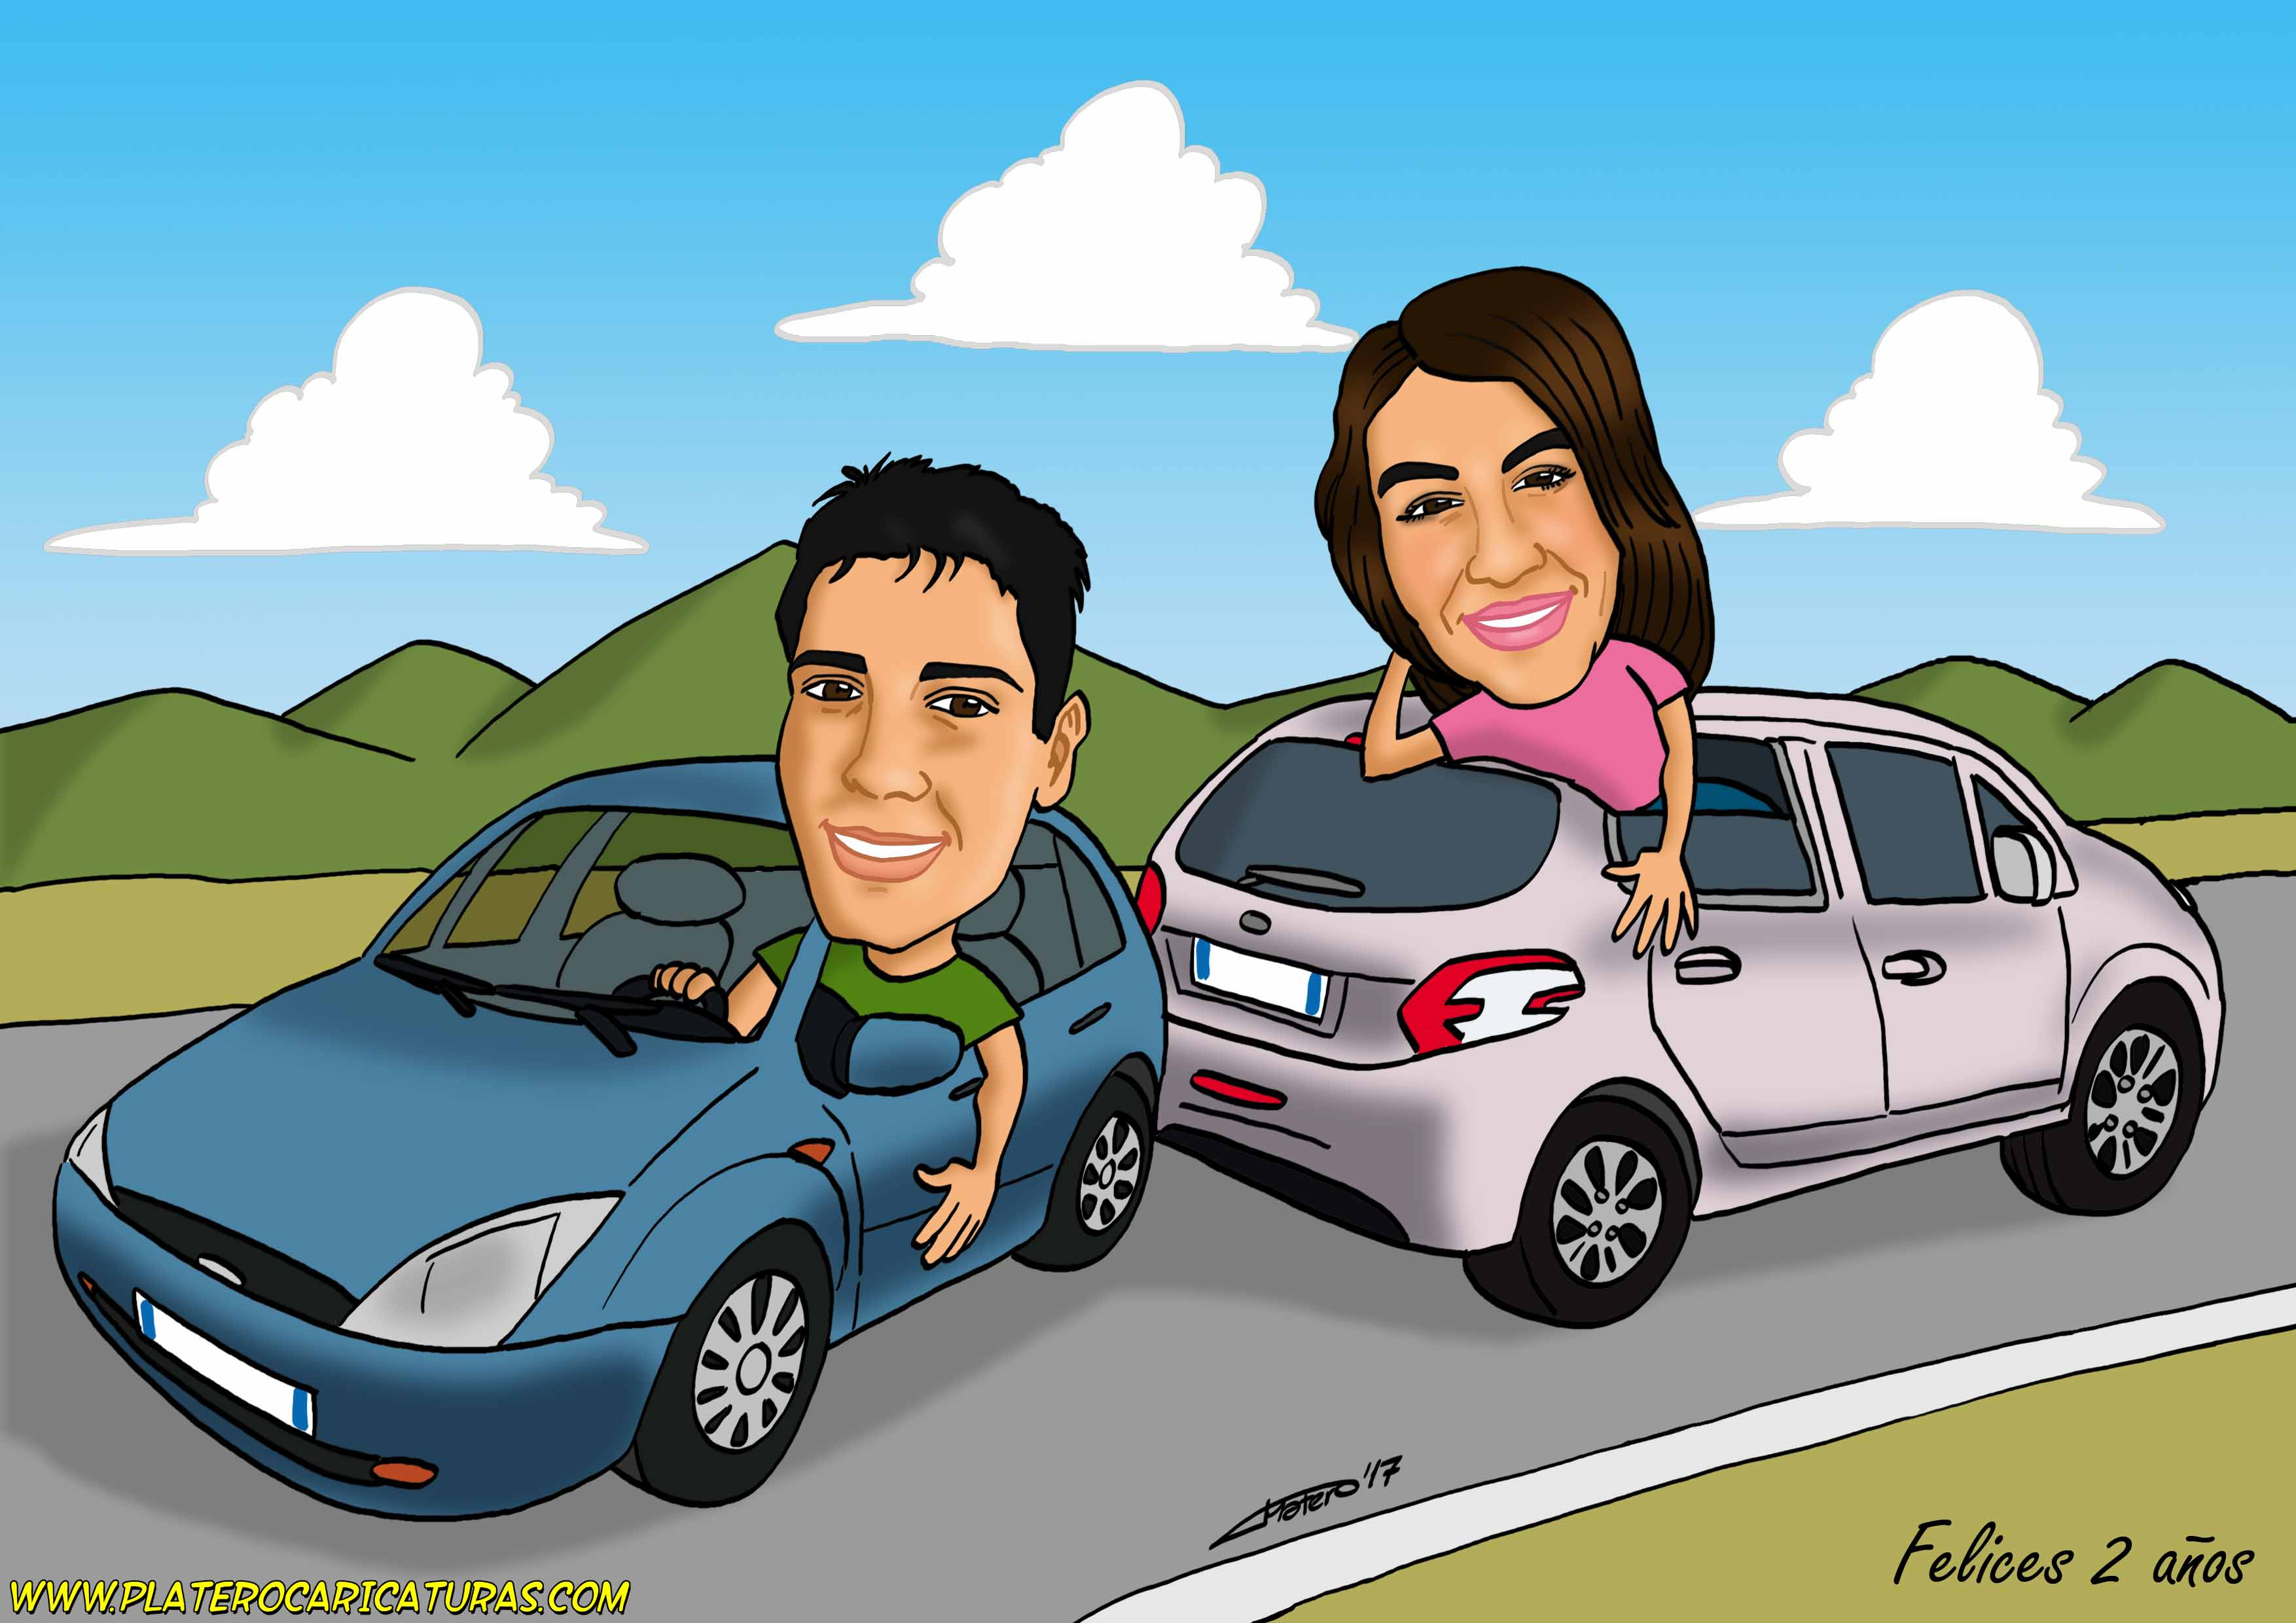 caricaturas_a_color_por_encargo_personalizadas_chico_chica_coches_pareja_aniversario_platerocaricatu